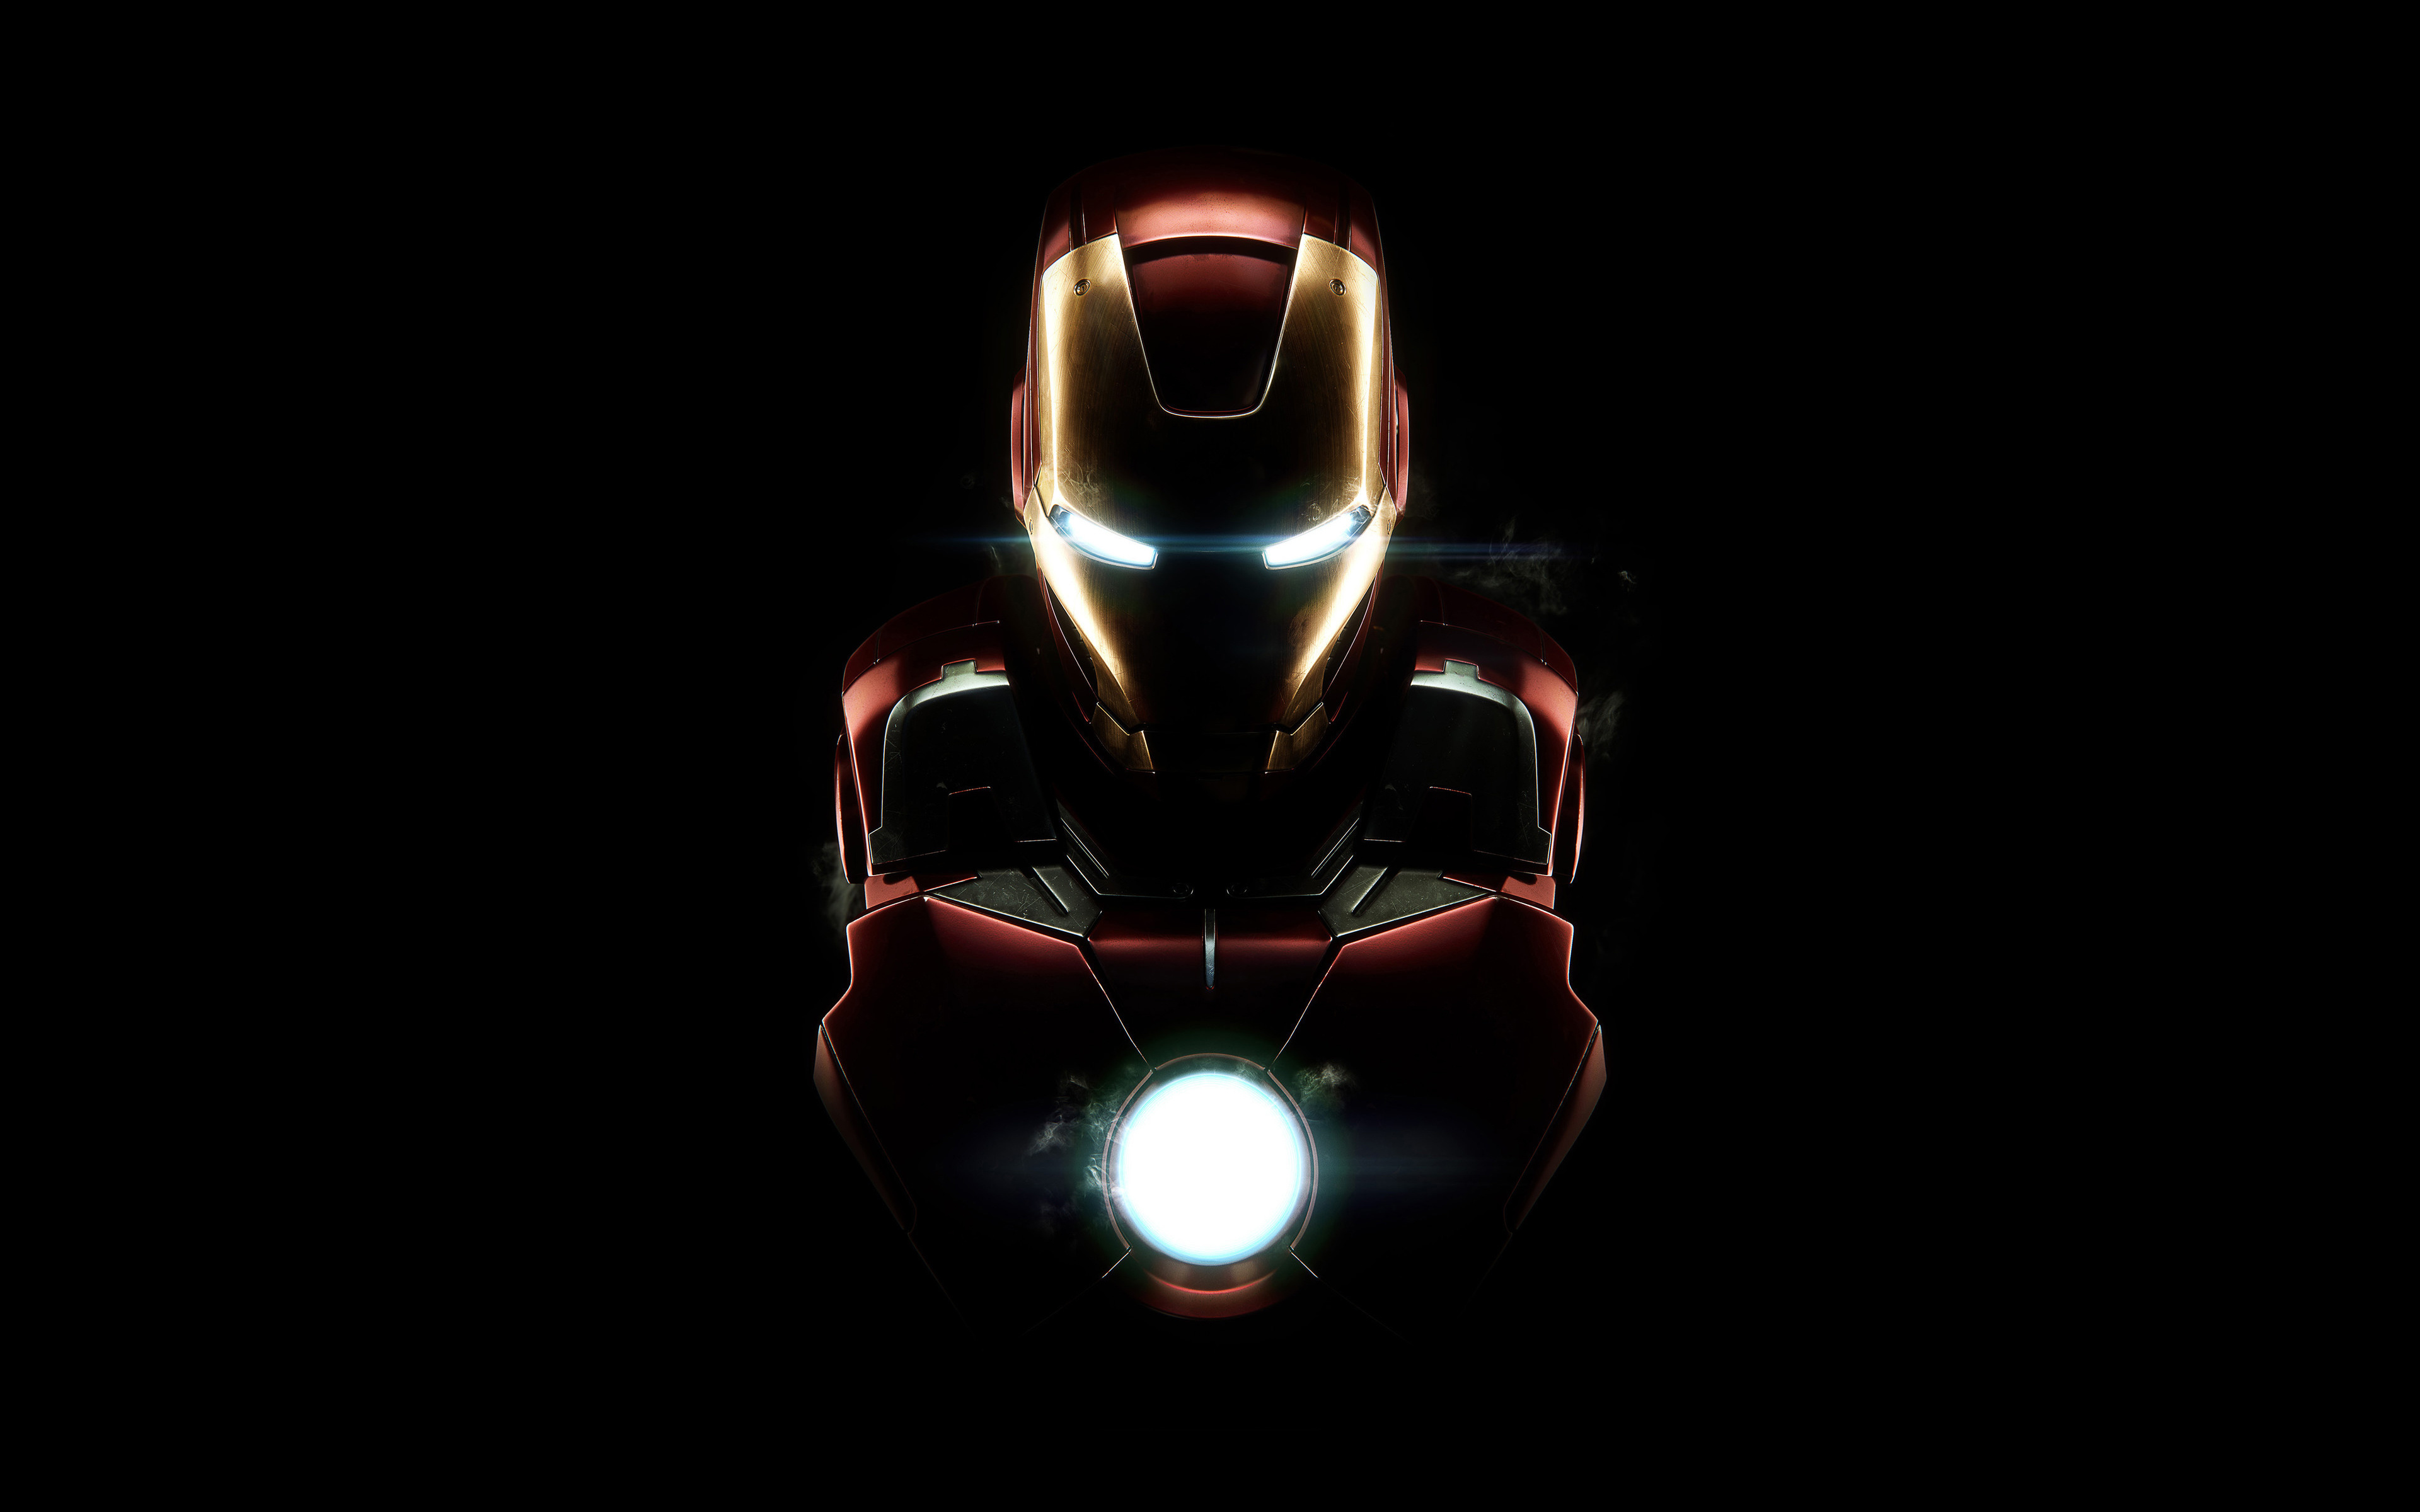 Download 3840x2400 Wallpaper Iron Man Dark Armor Mark Vii 4k